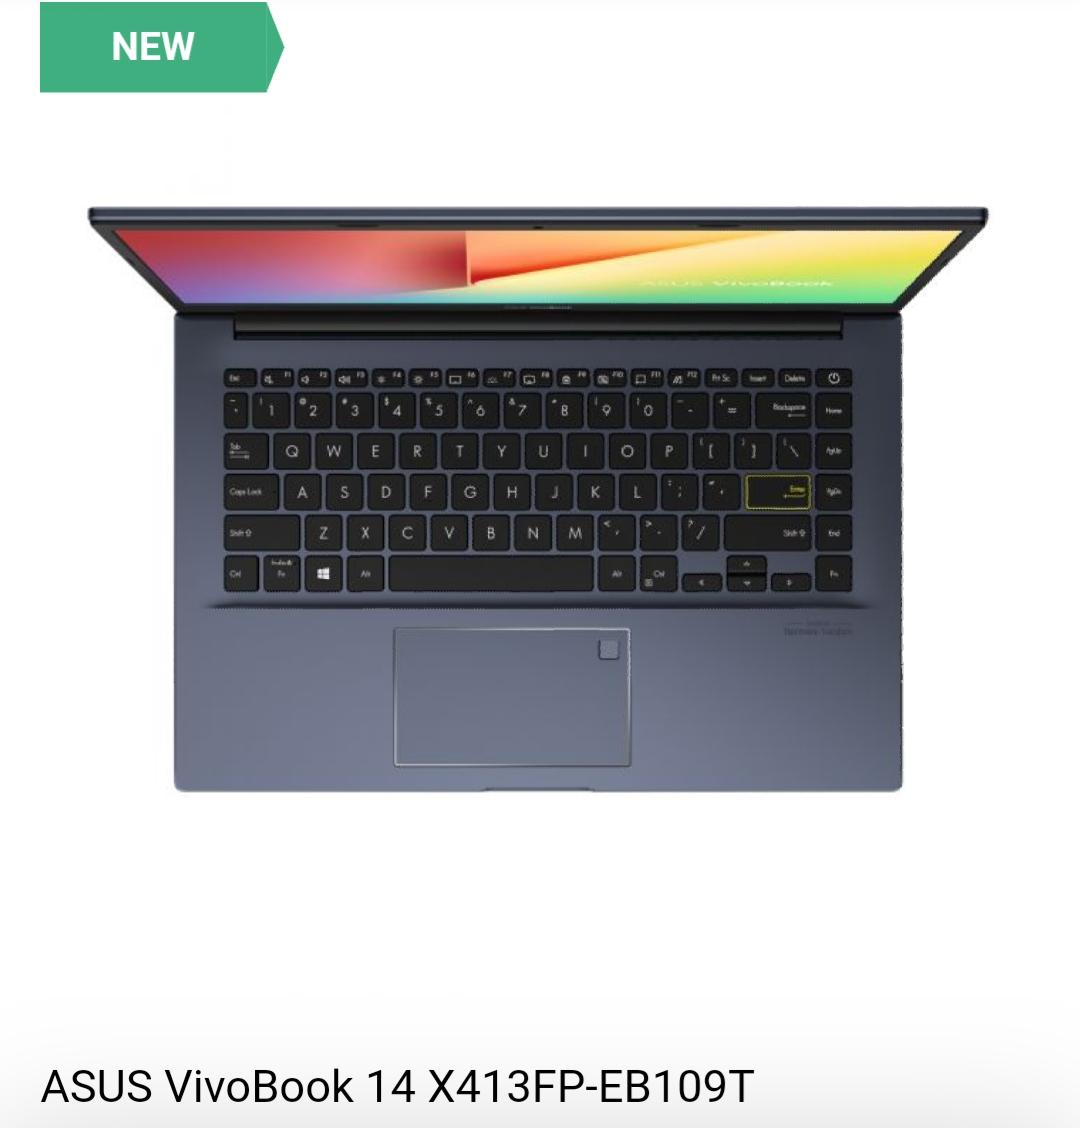 Asus VivoBook 14x413FP Topview